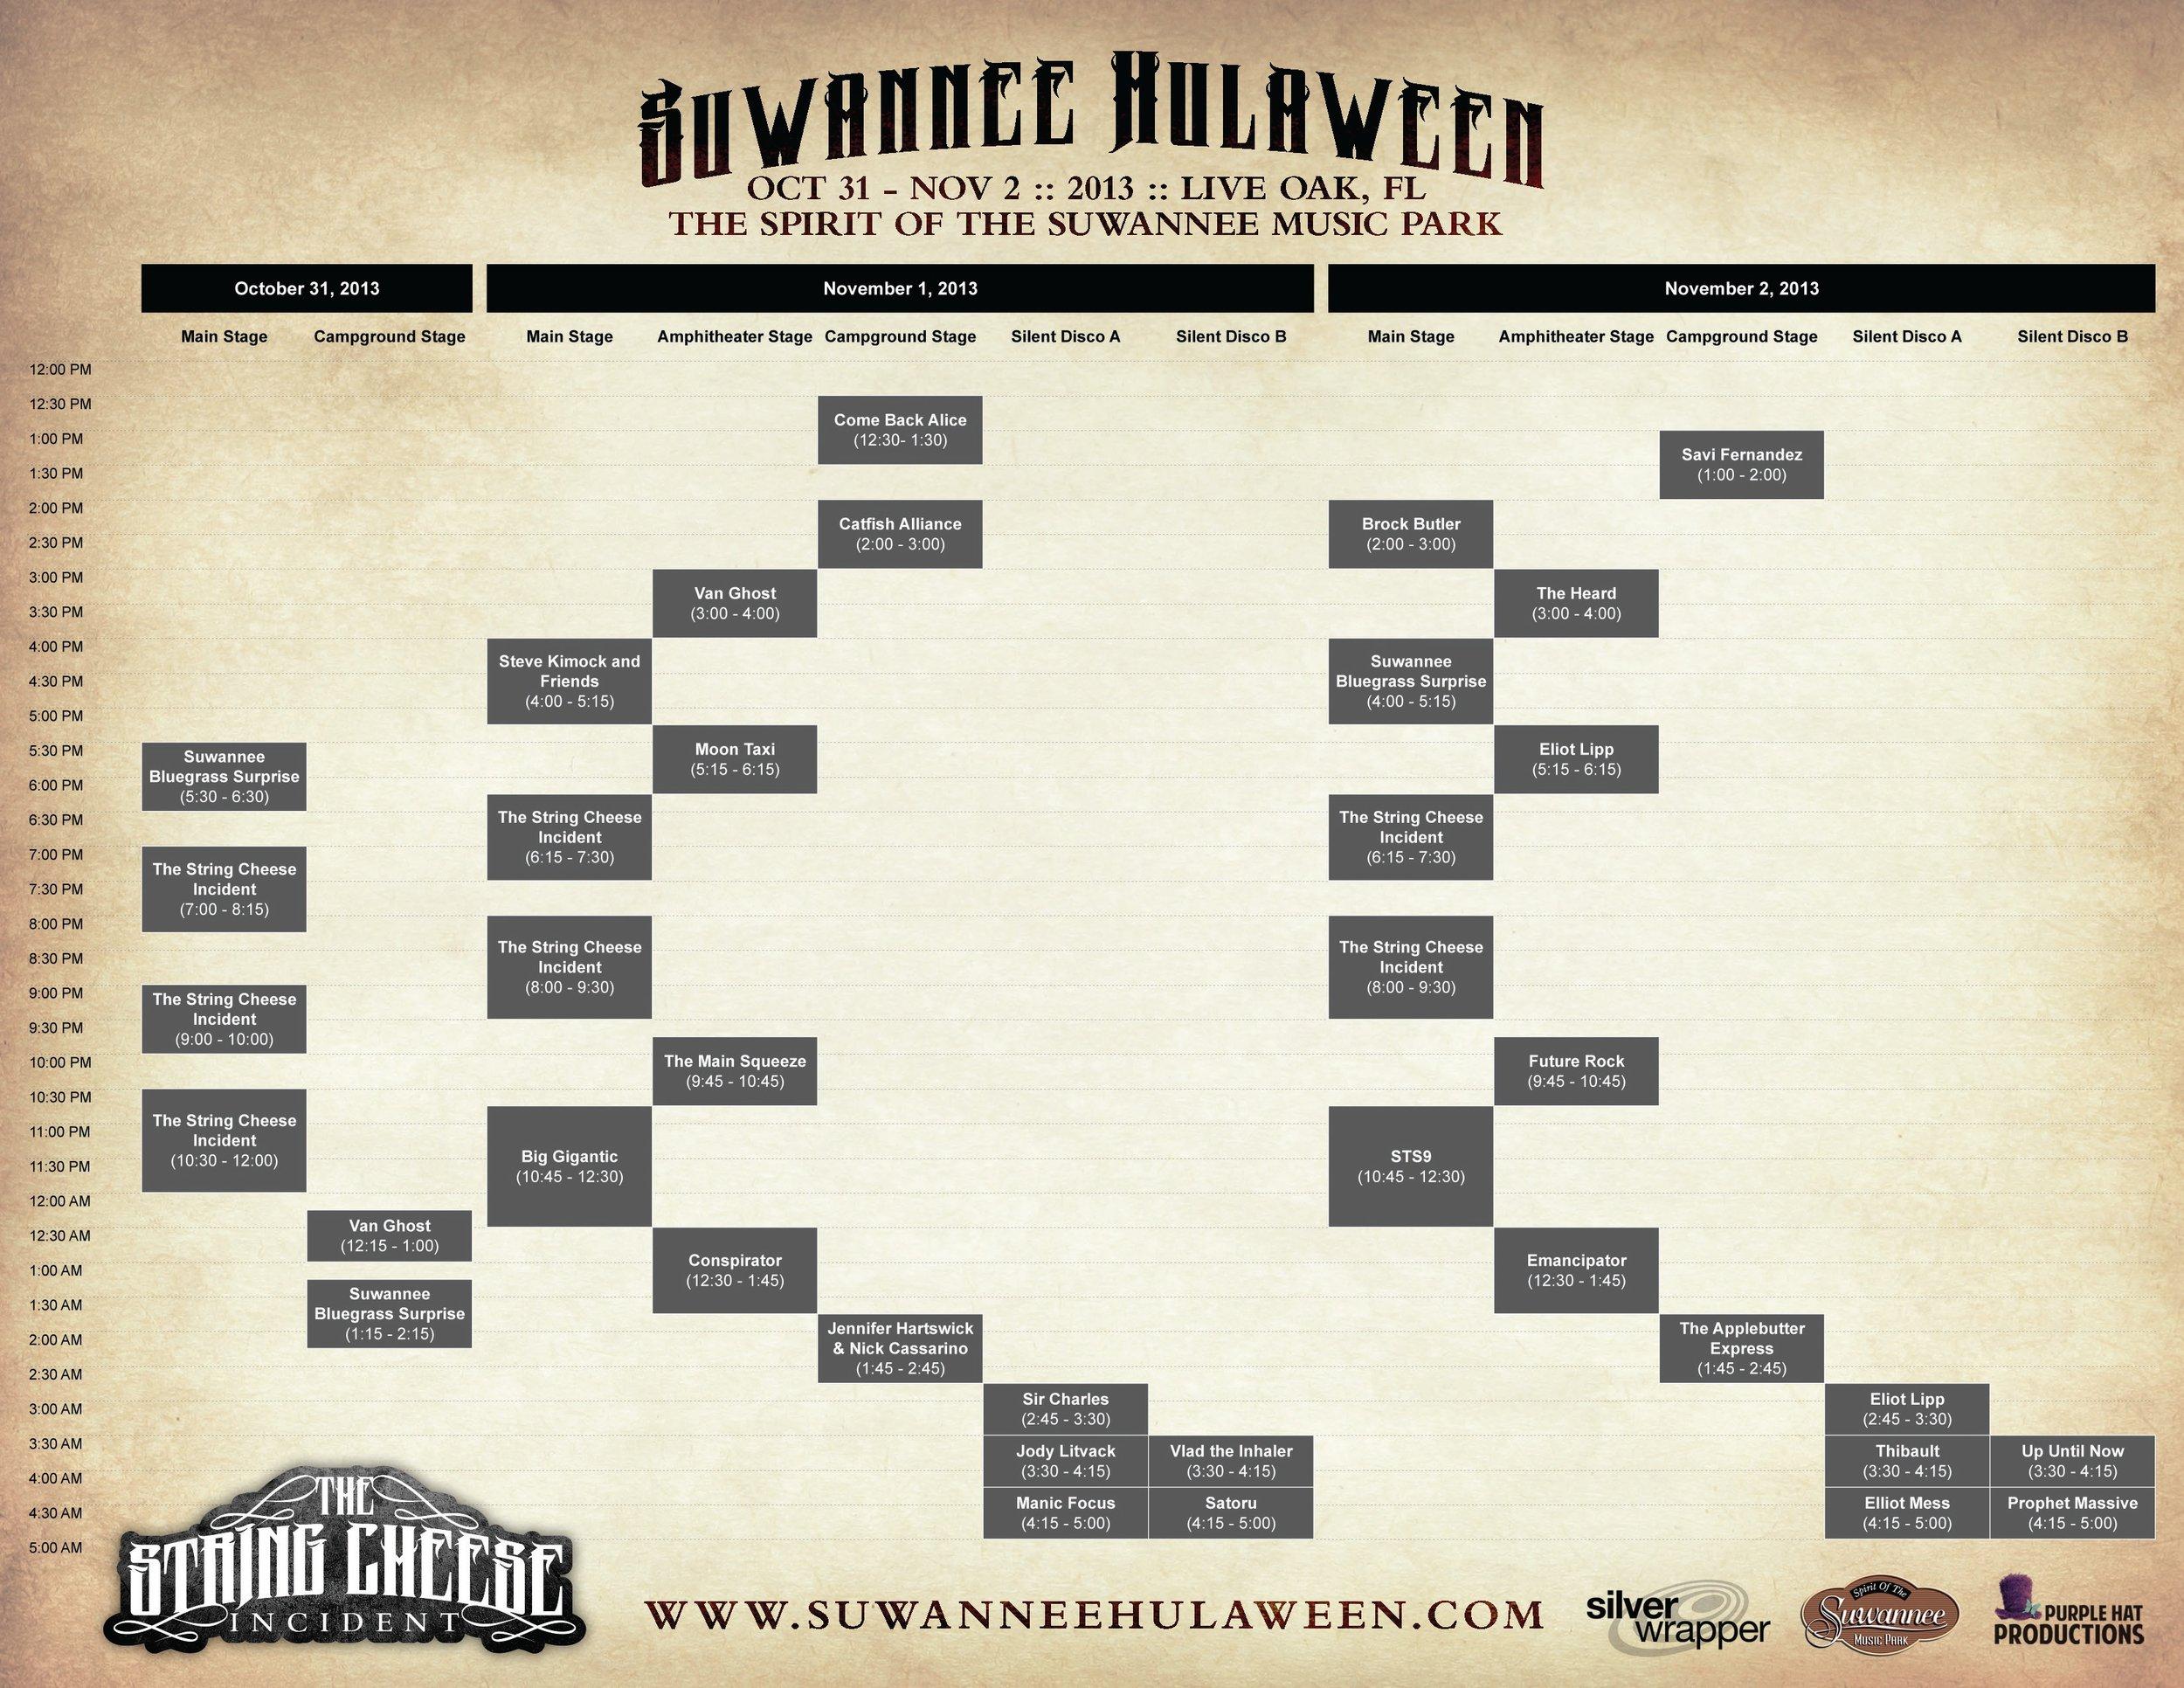 Suwannee Hulaween 2013 Schedule